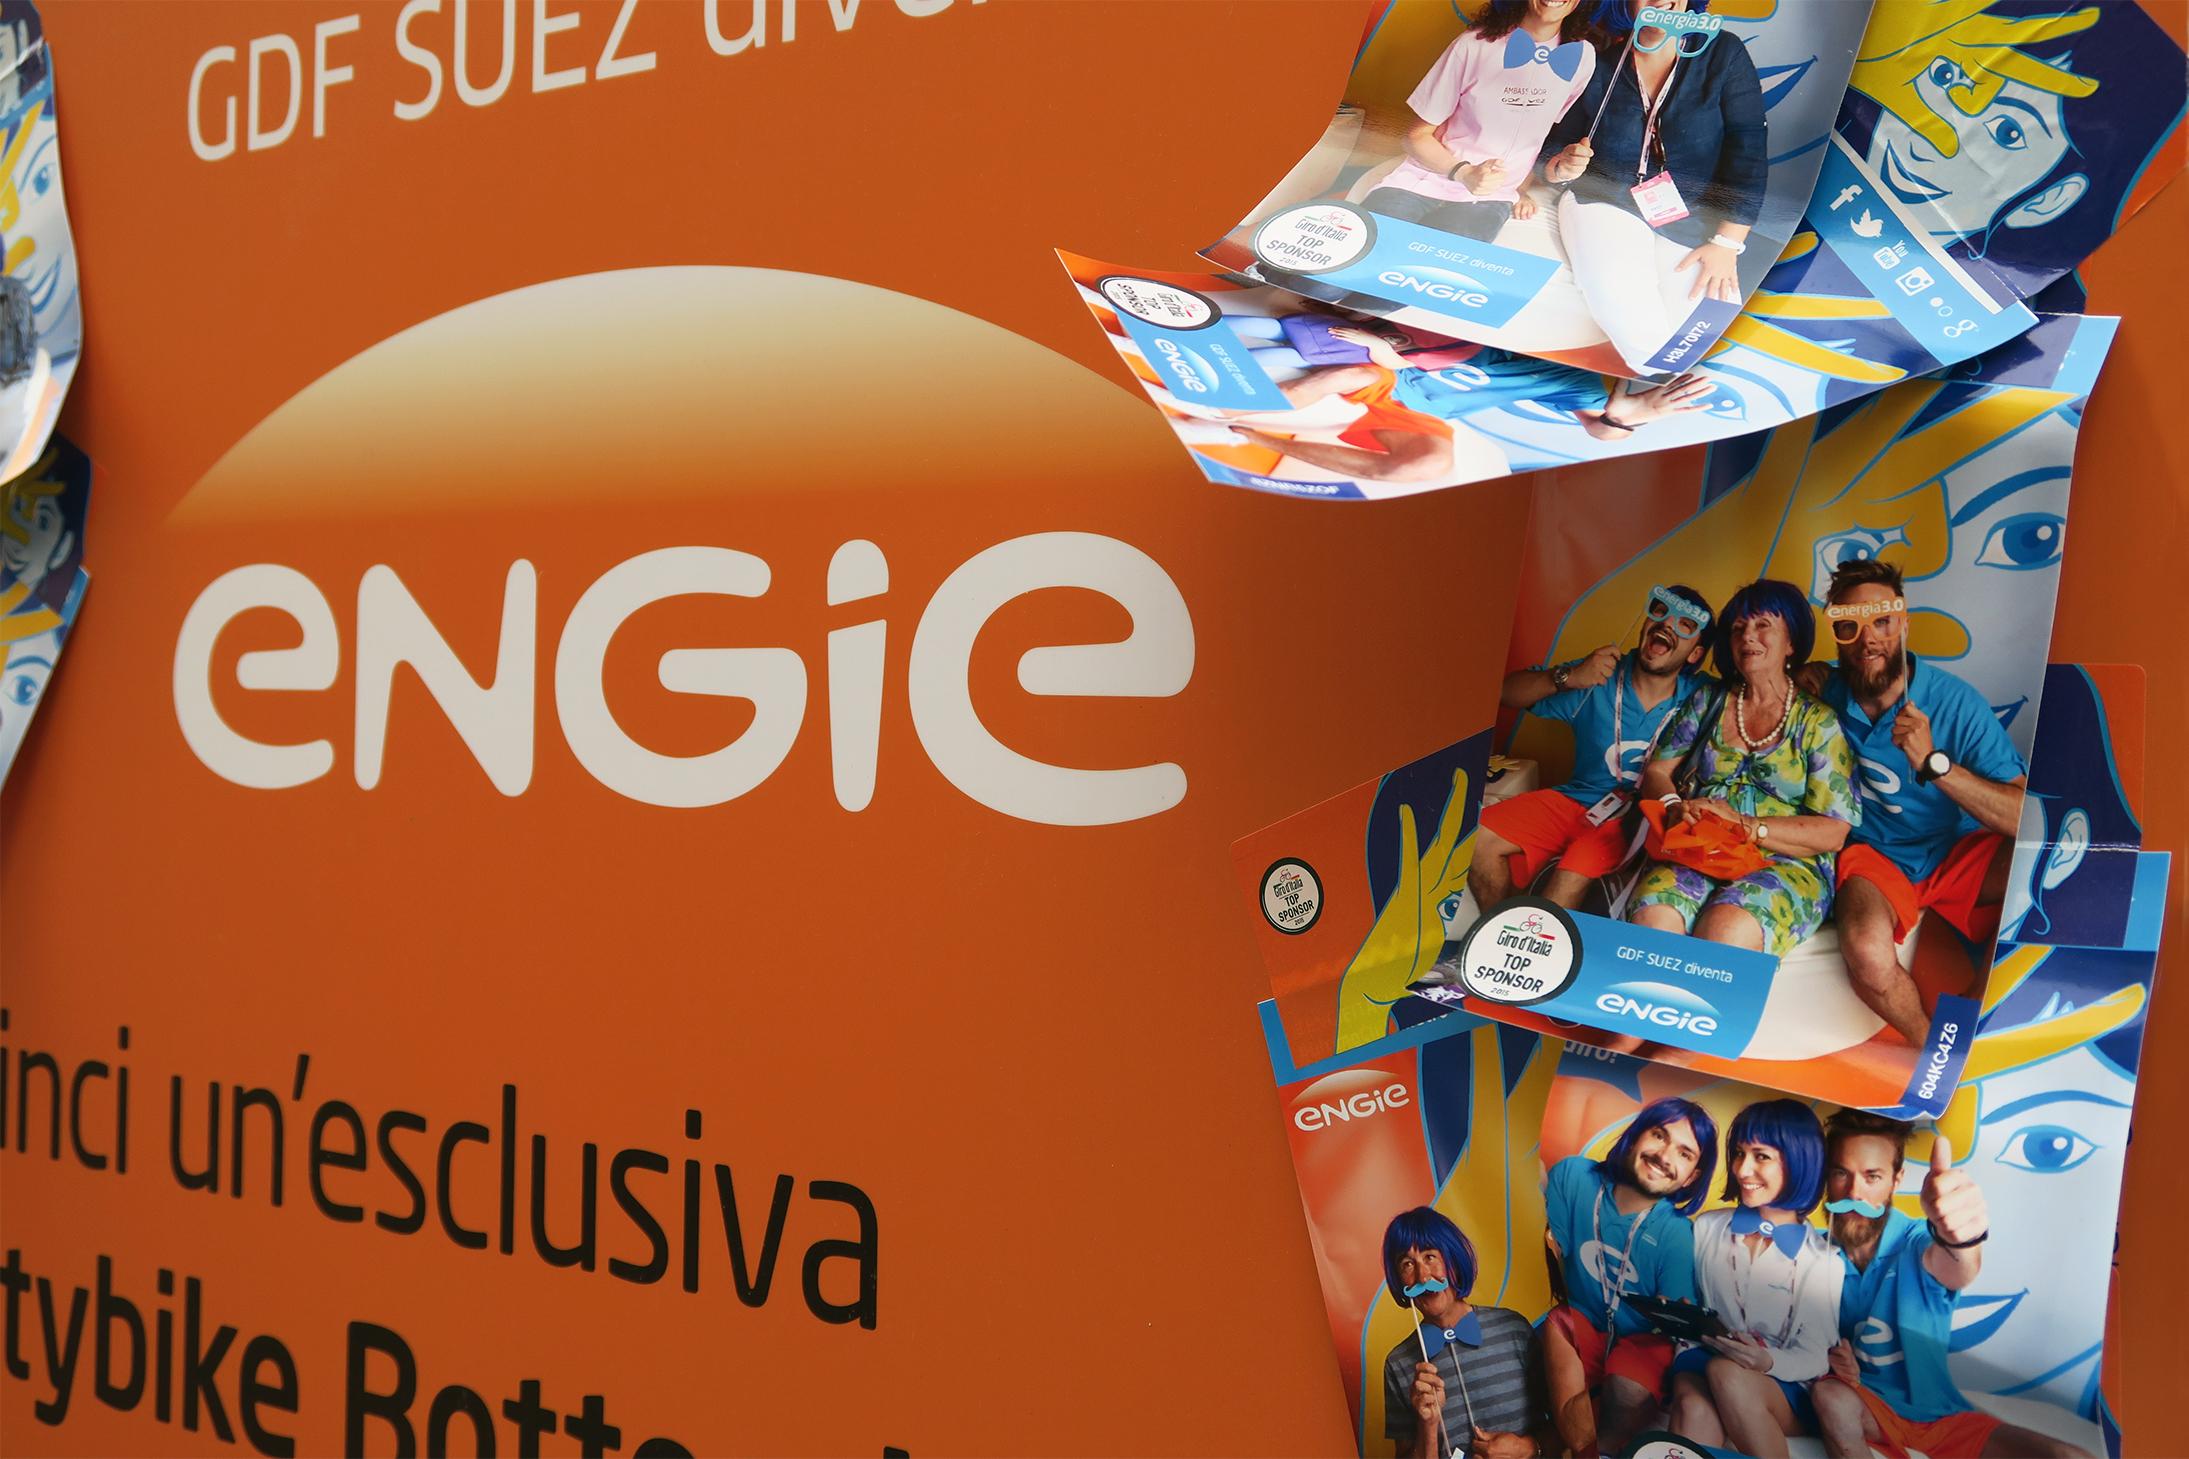 ENGIE GIRO D'ITALIA 2015